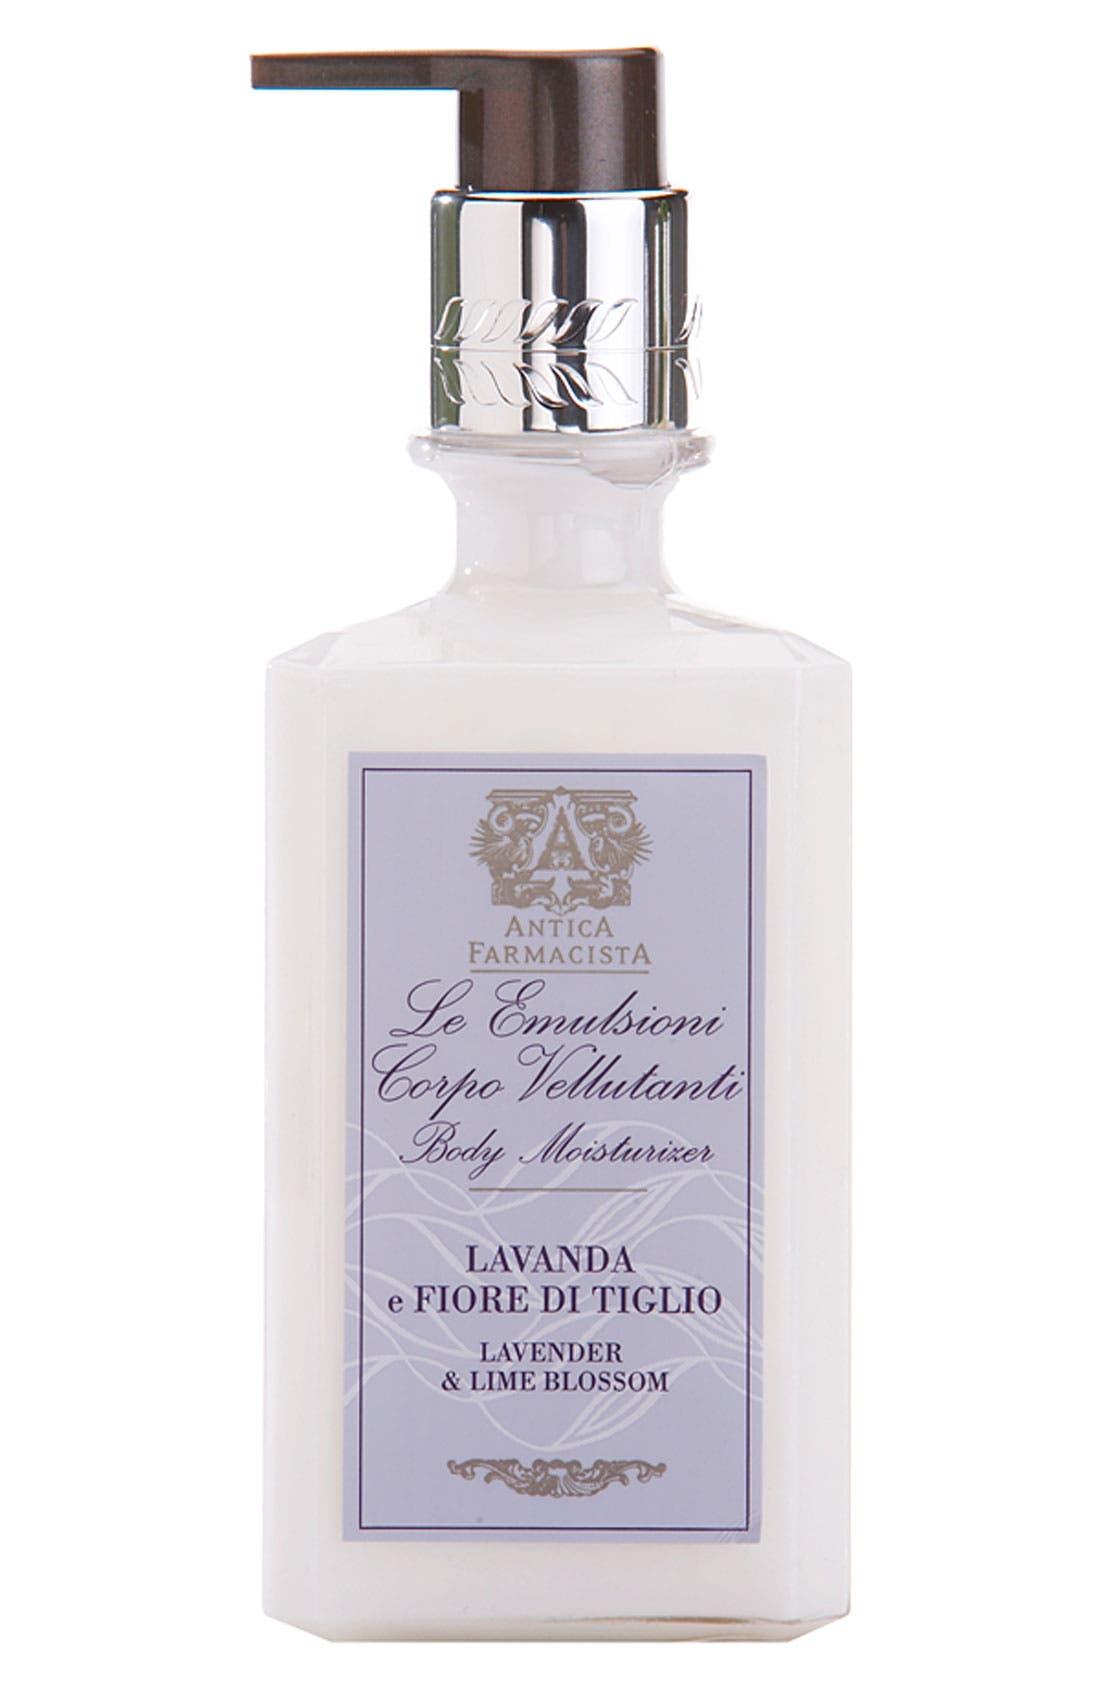 Antica Farmacista 'Lavender & Lime Blossom' Body Moisturizer